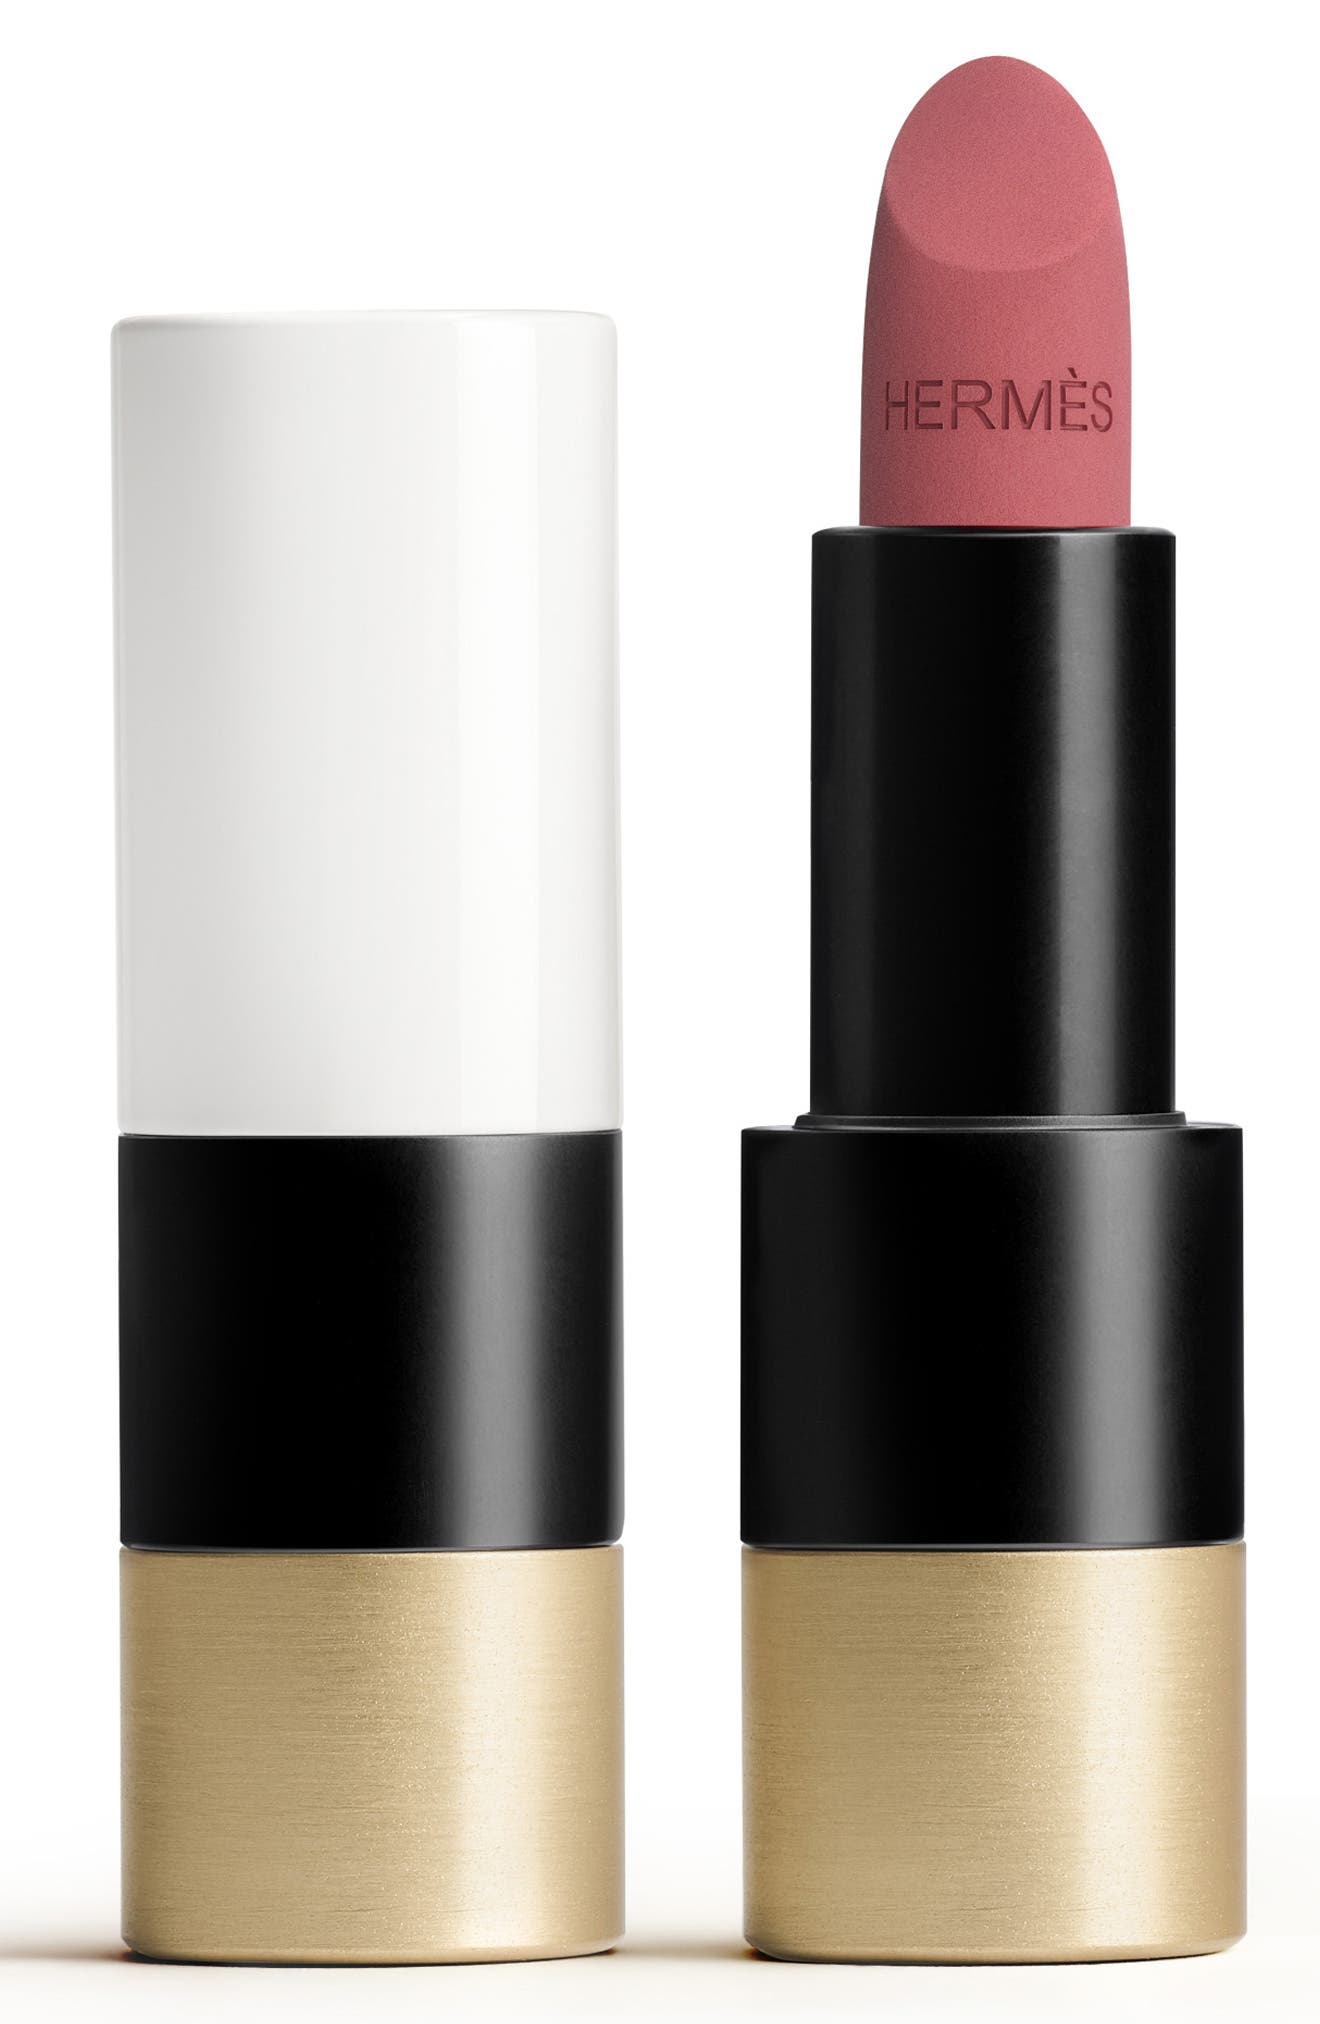 Rouge Hermès - Matte lipstick   Nordstrom